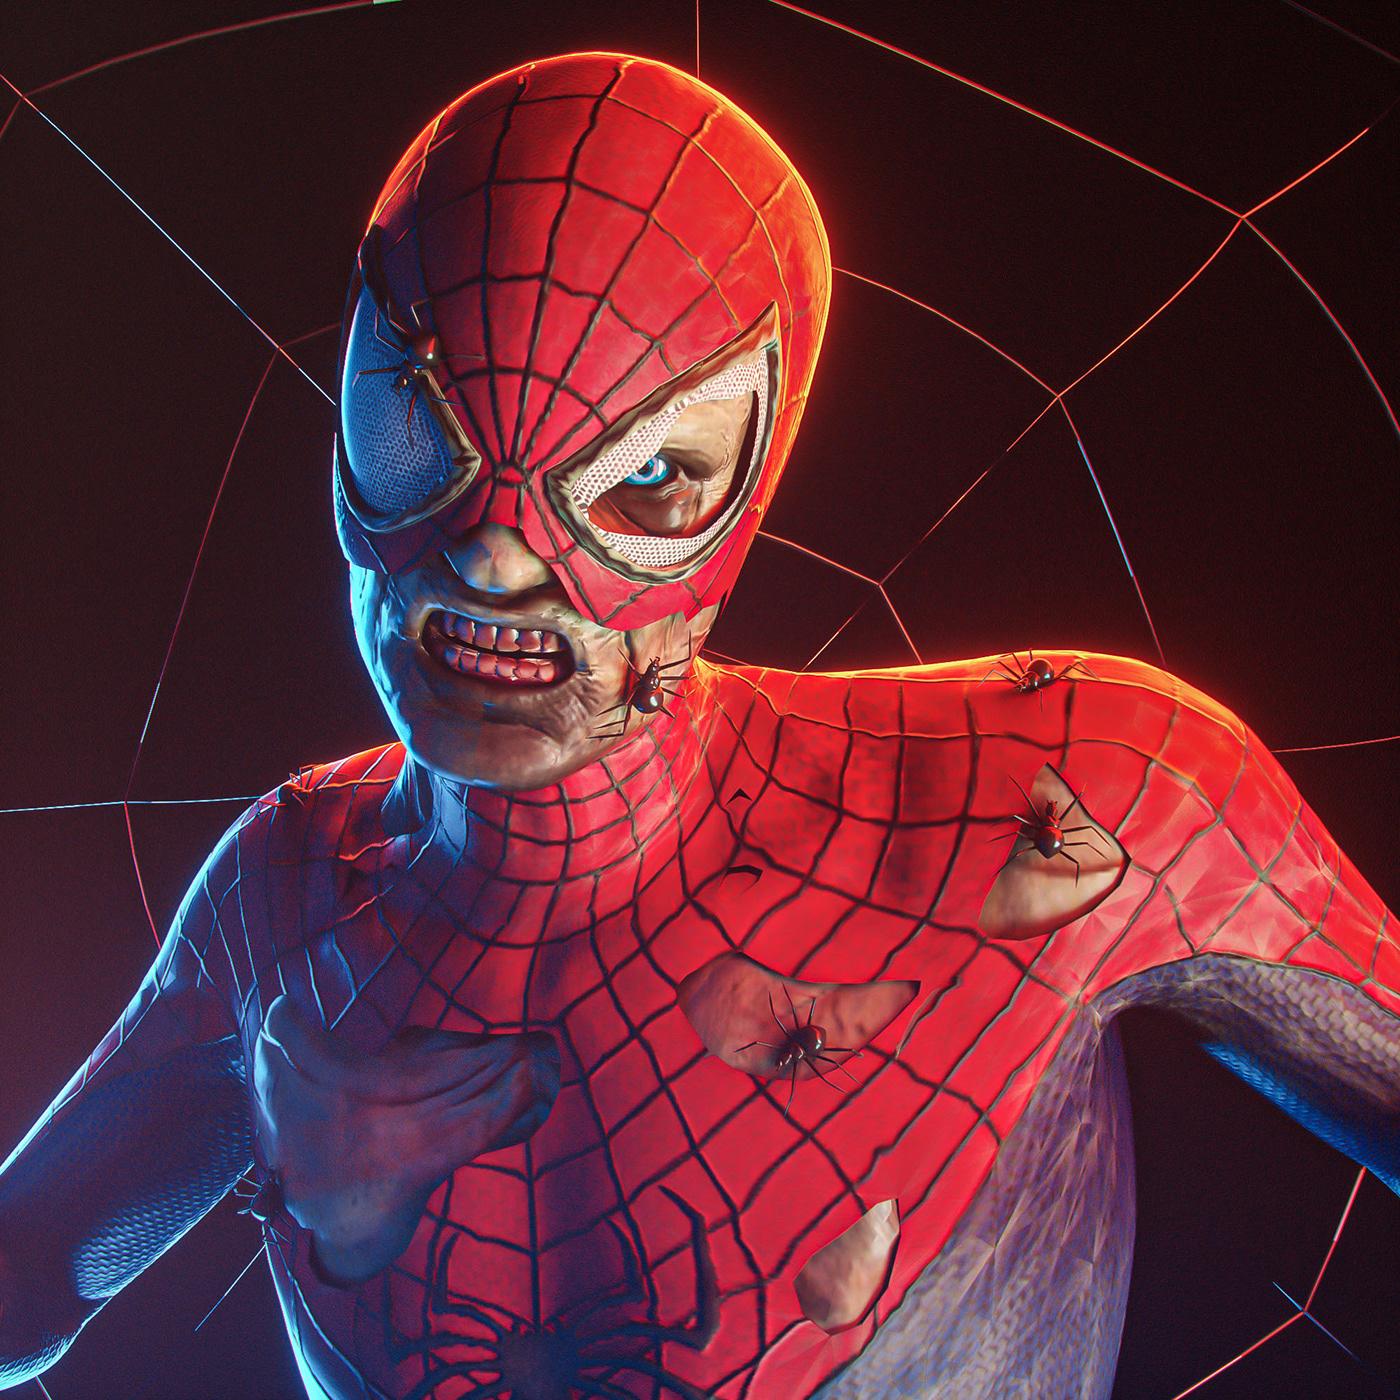 artwork comic comics Digital Art  fanart ILLUSTRATION  lighting portrait study SuperHero